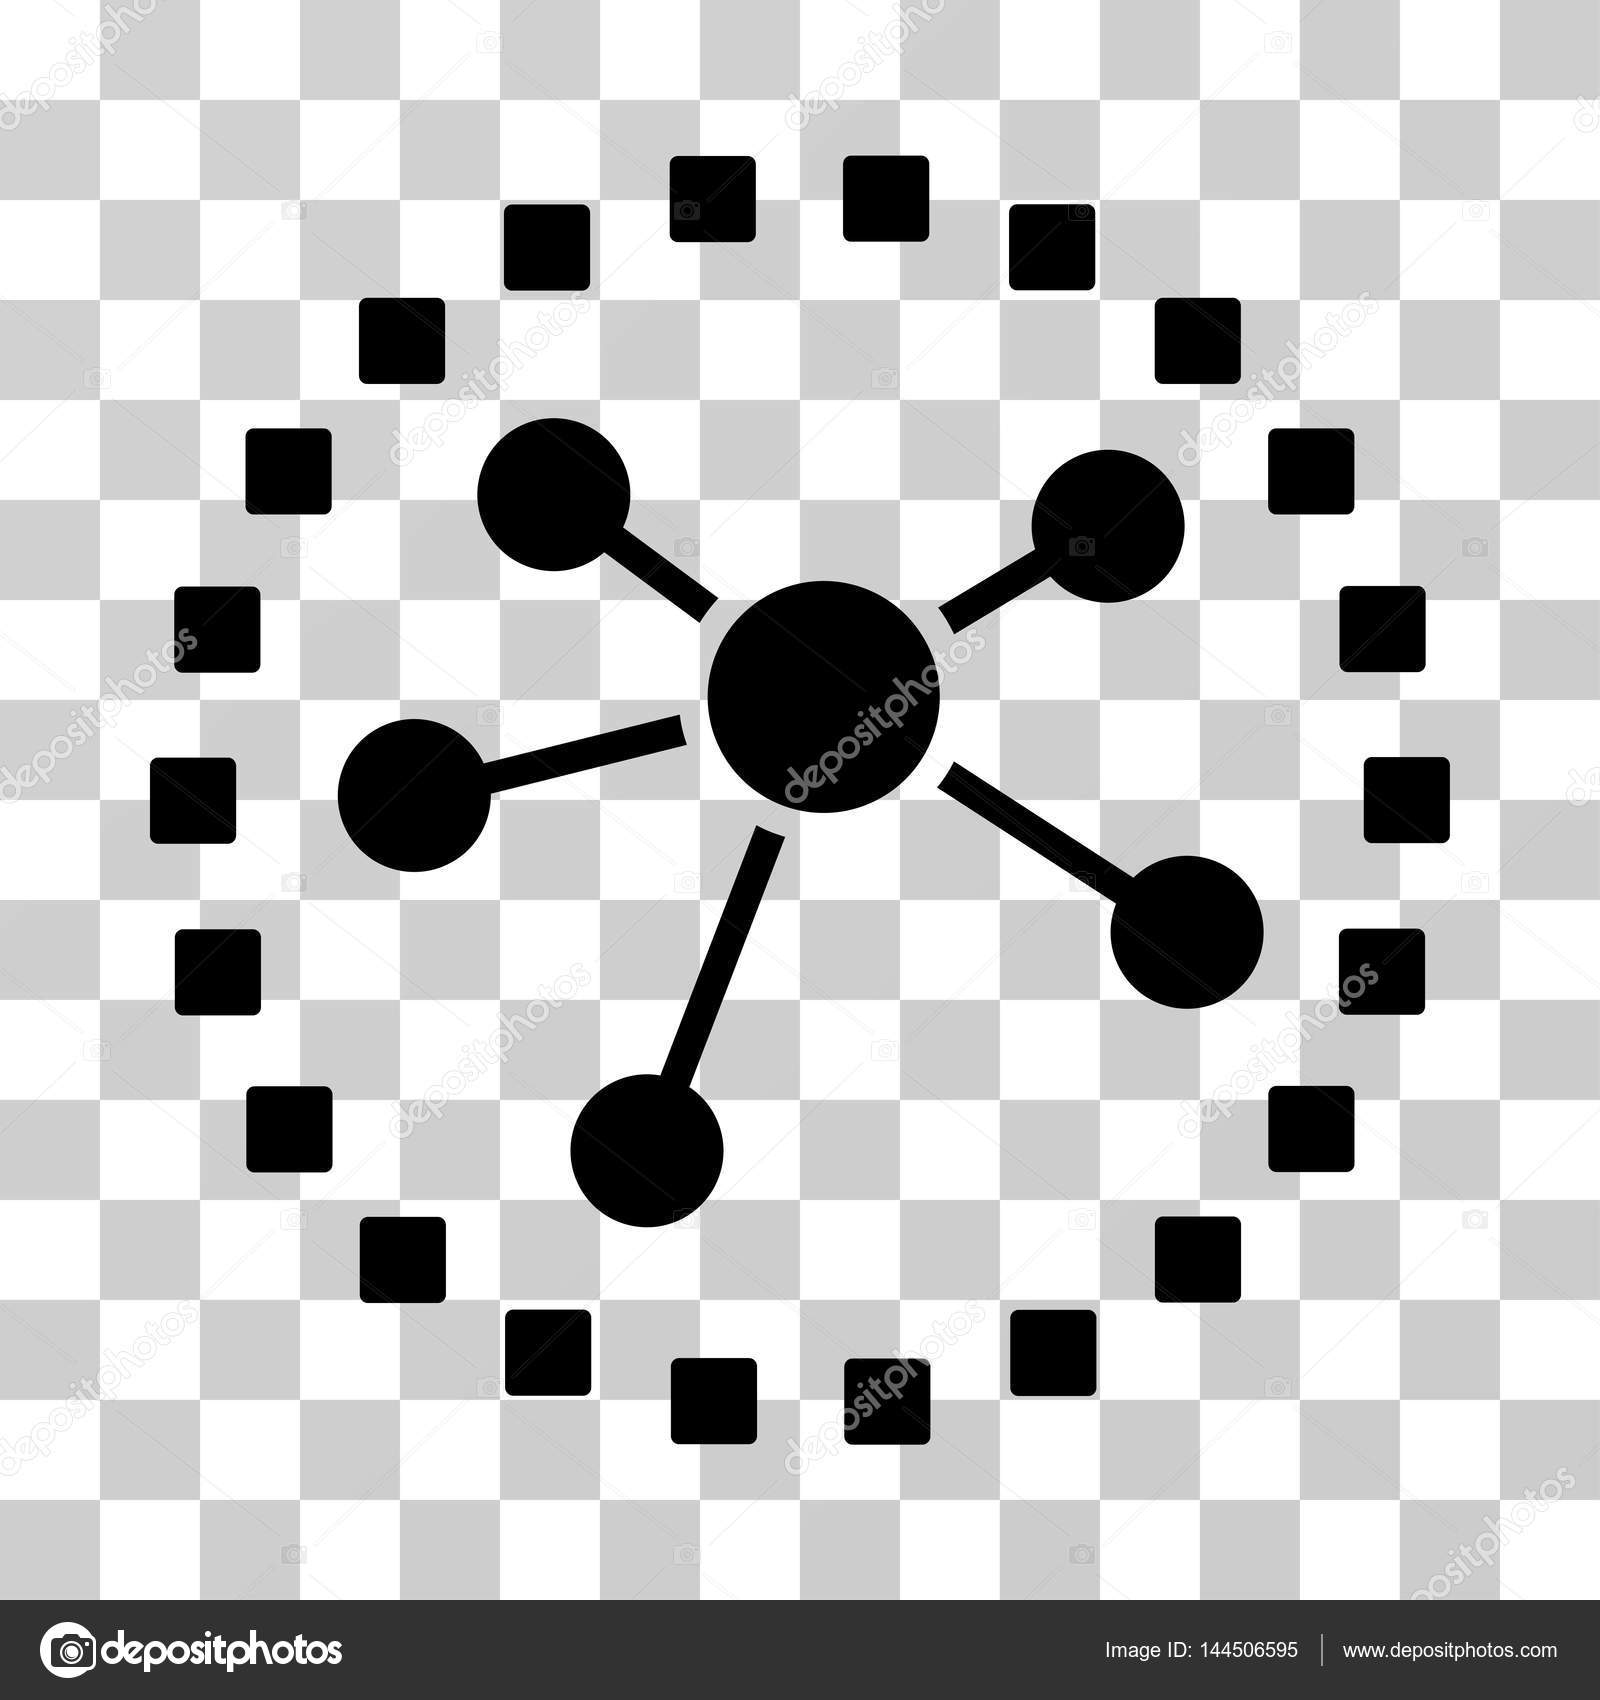 Links diagram vector icon vetores de stock ahasoft 144506595 links diagram vector icon vetores de stock ccuart Choice Image